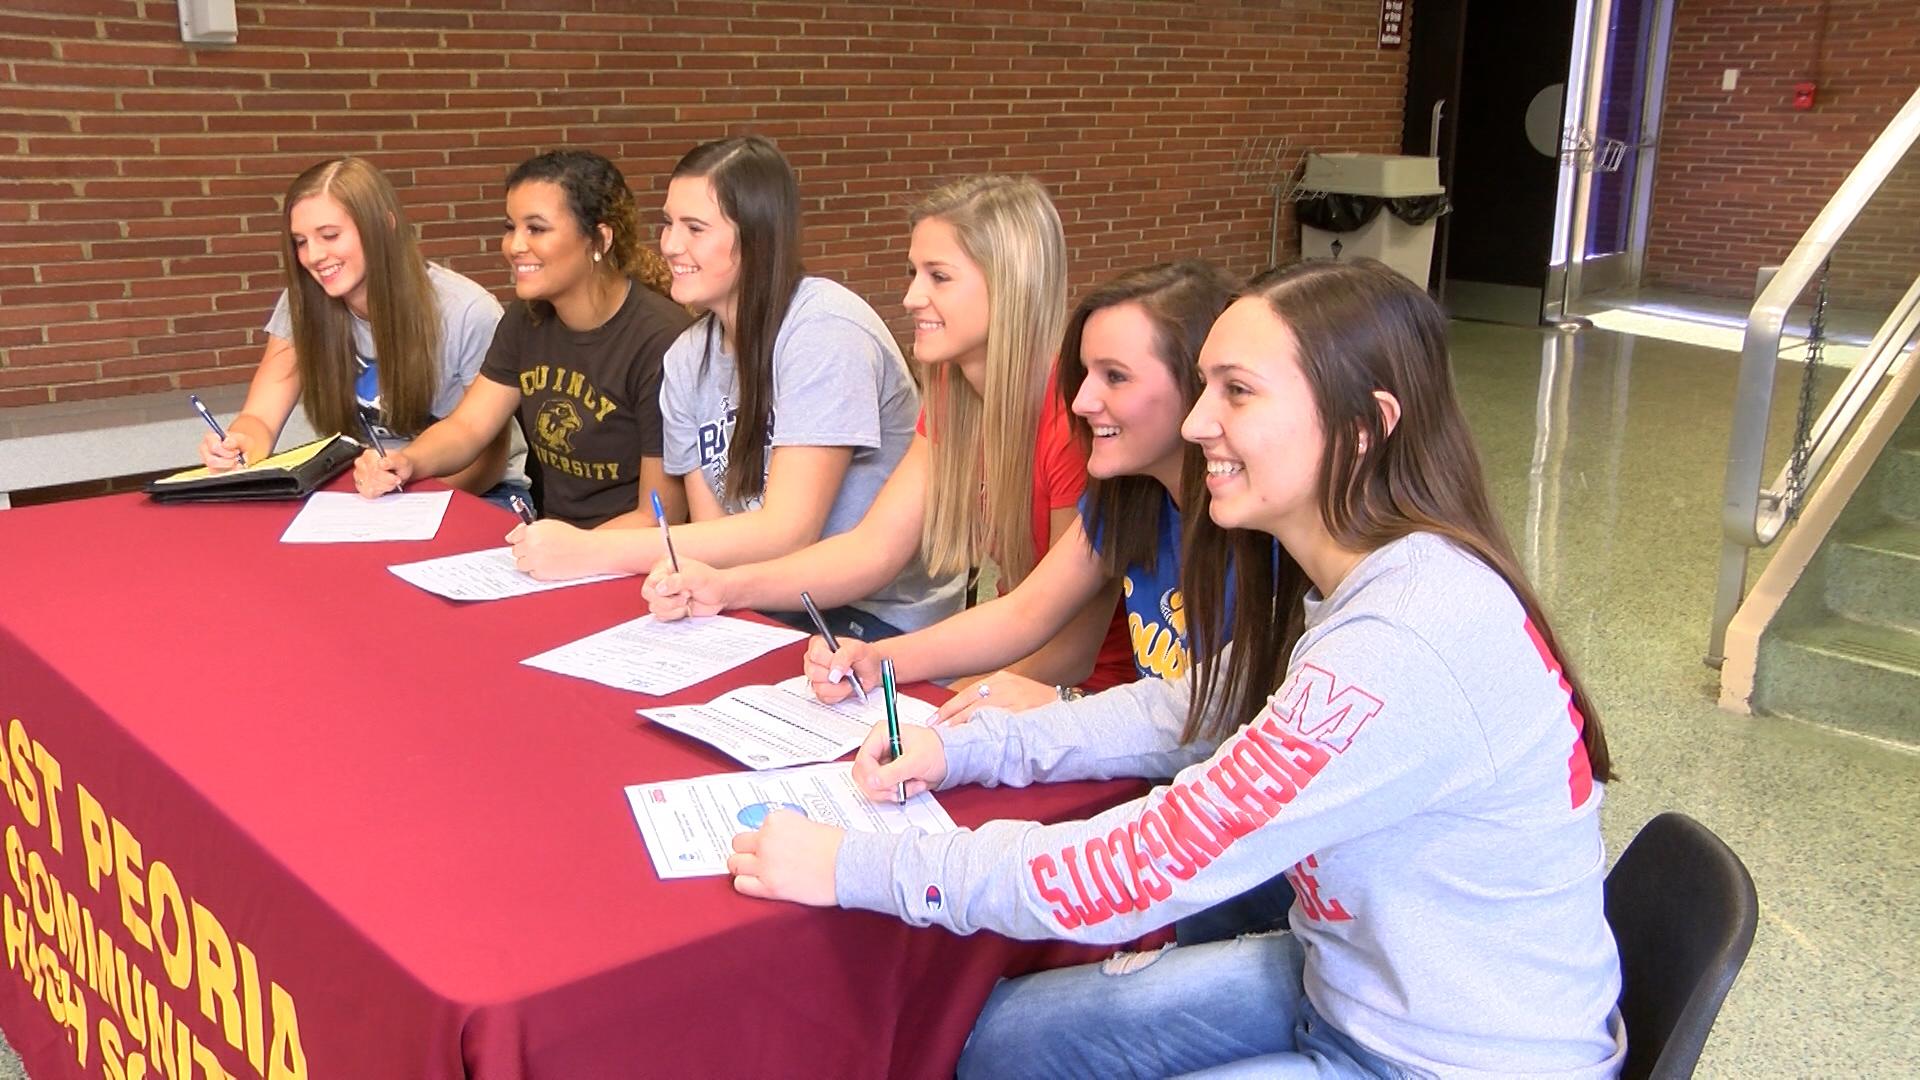 East Peoria softball girls at table_1478830493453.jpg